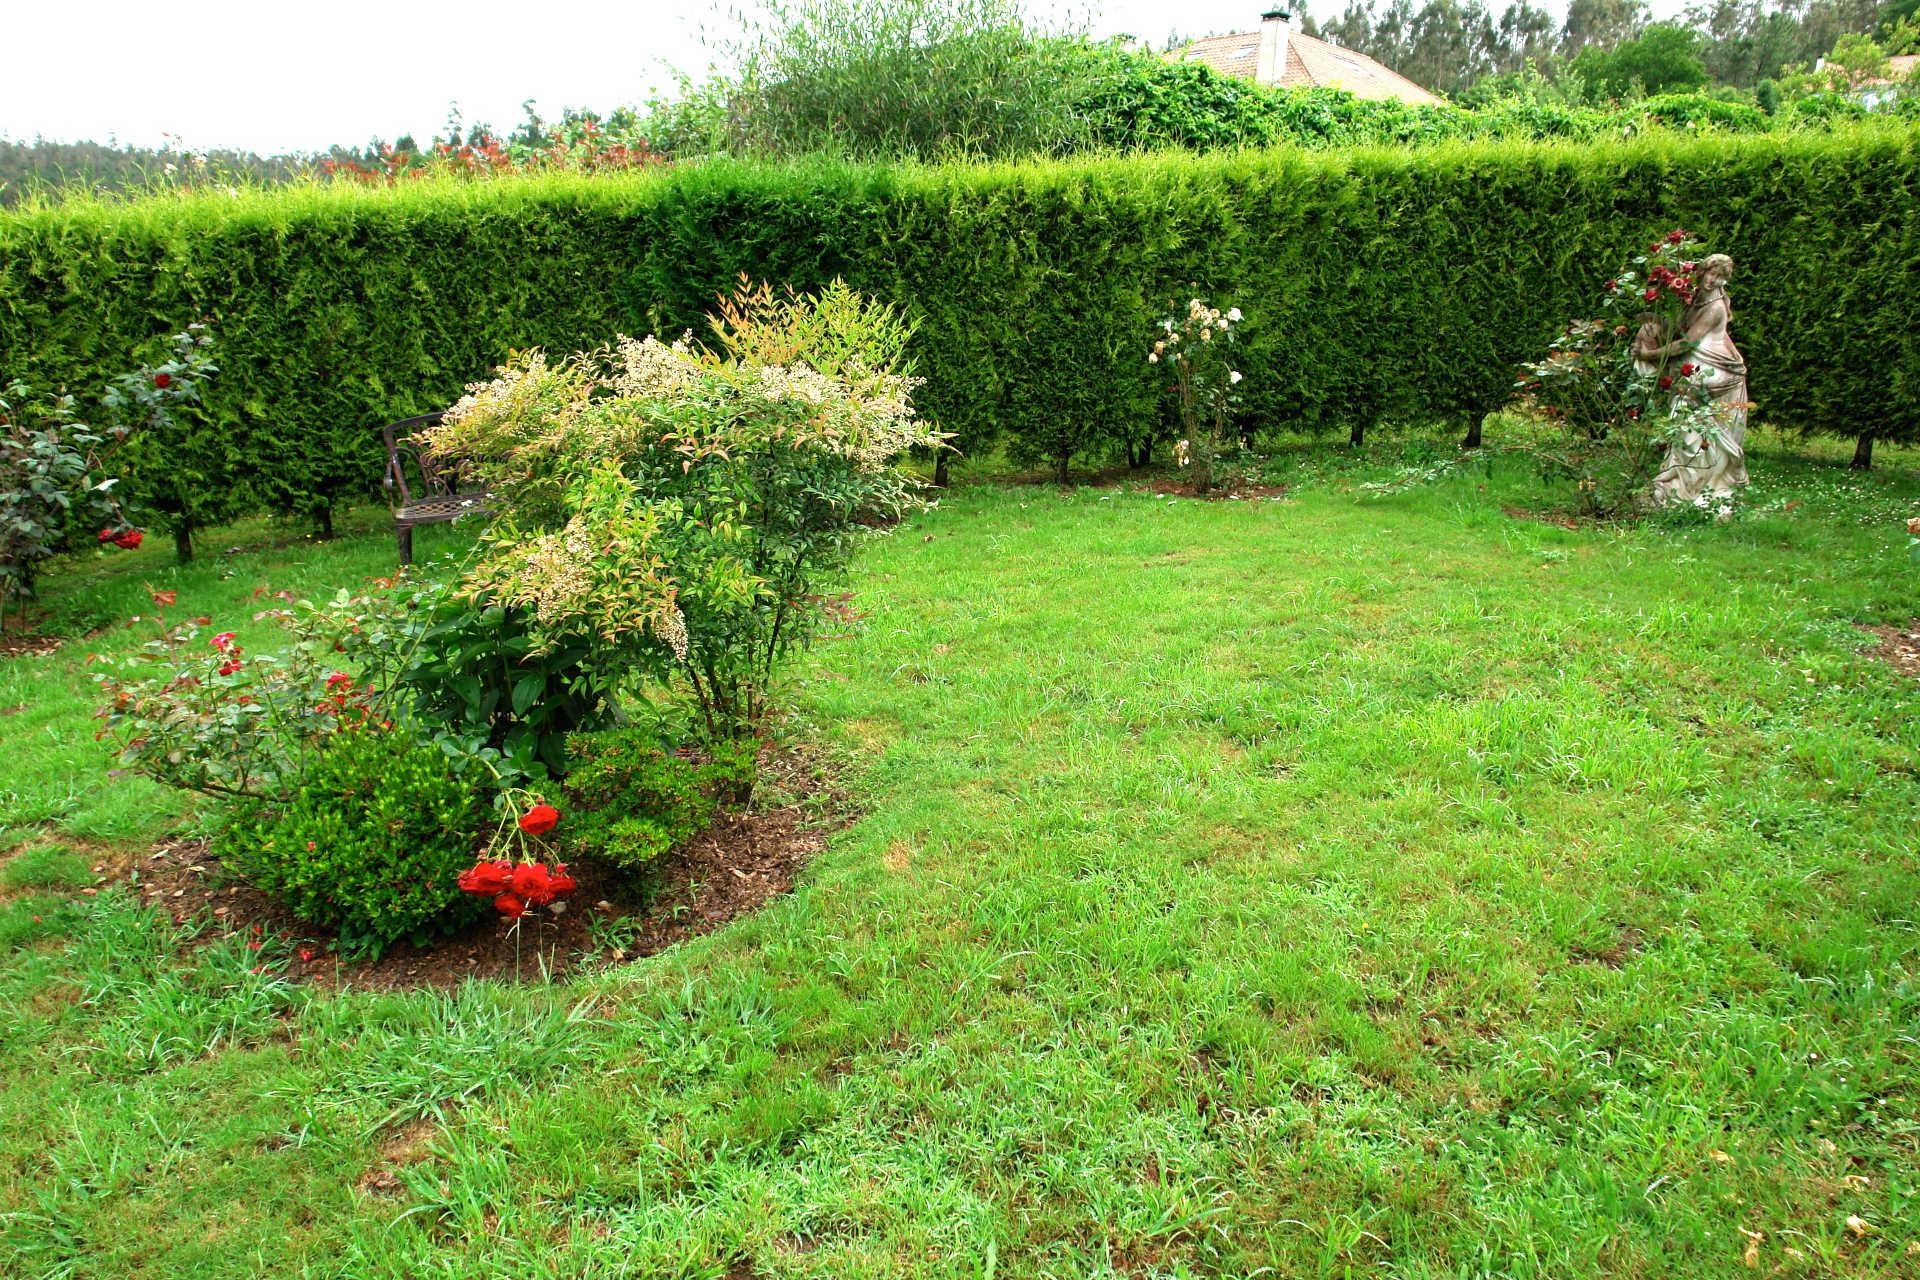 Jardines exteriores arbusto casa rural as seis chemineas for Casa rural mansion terraplen seis